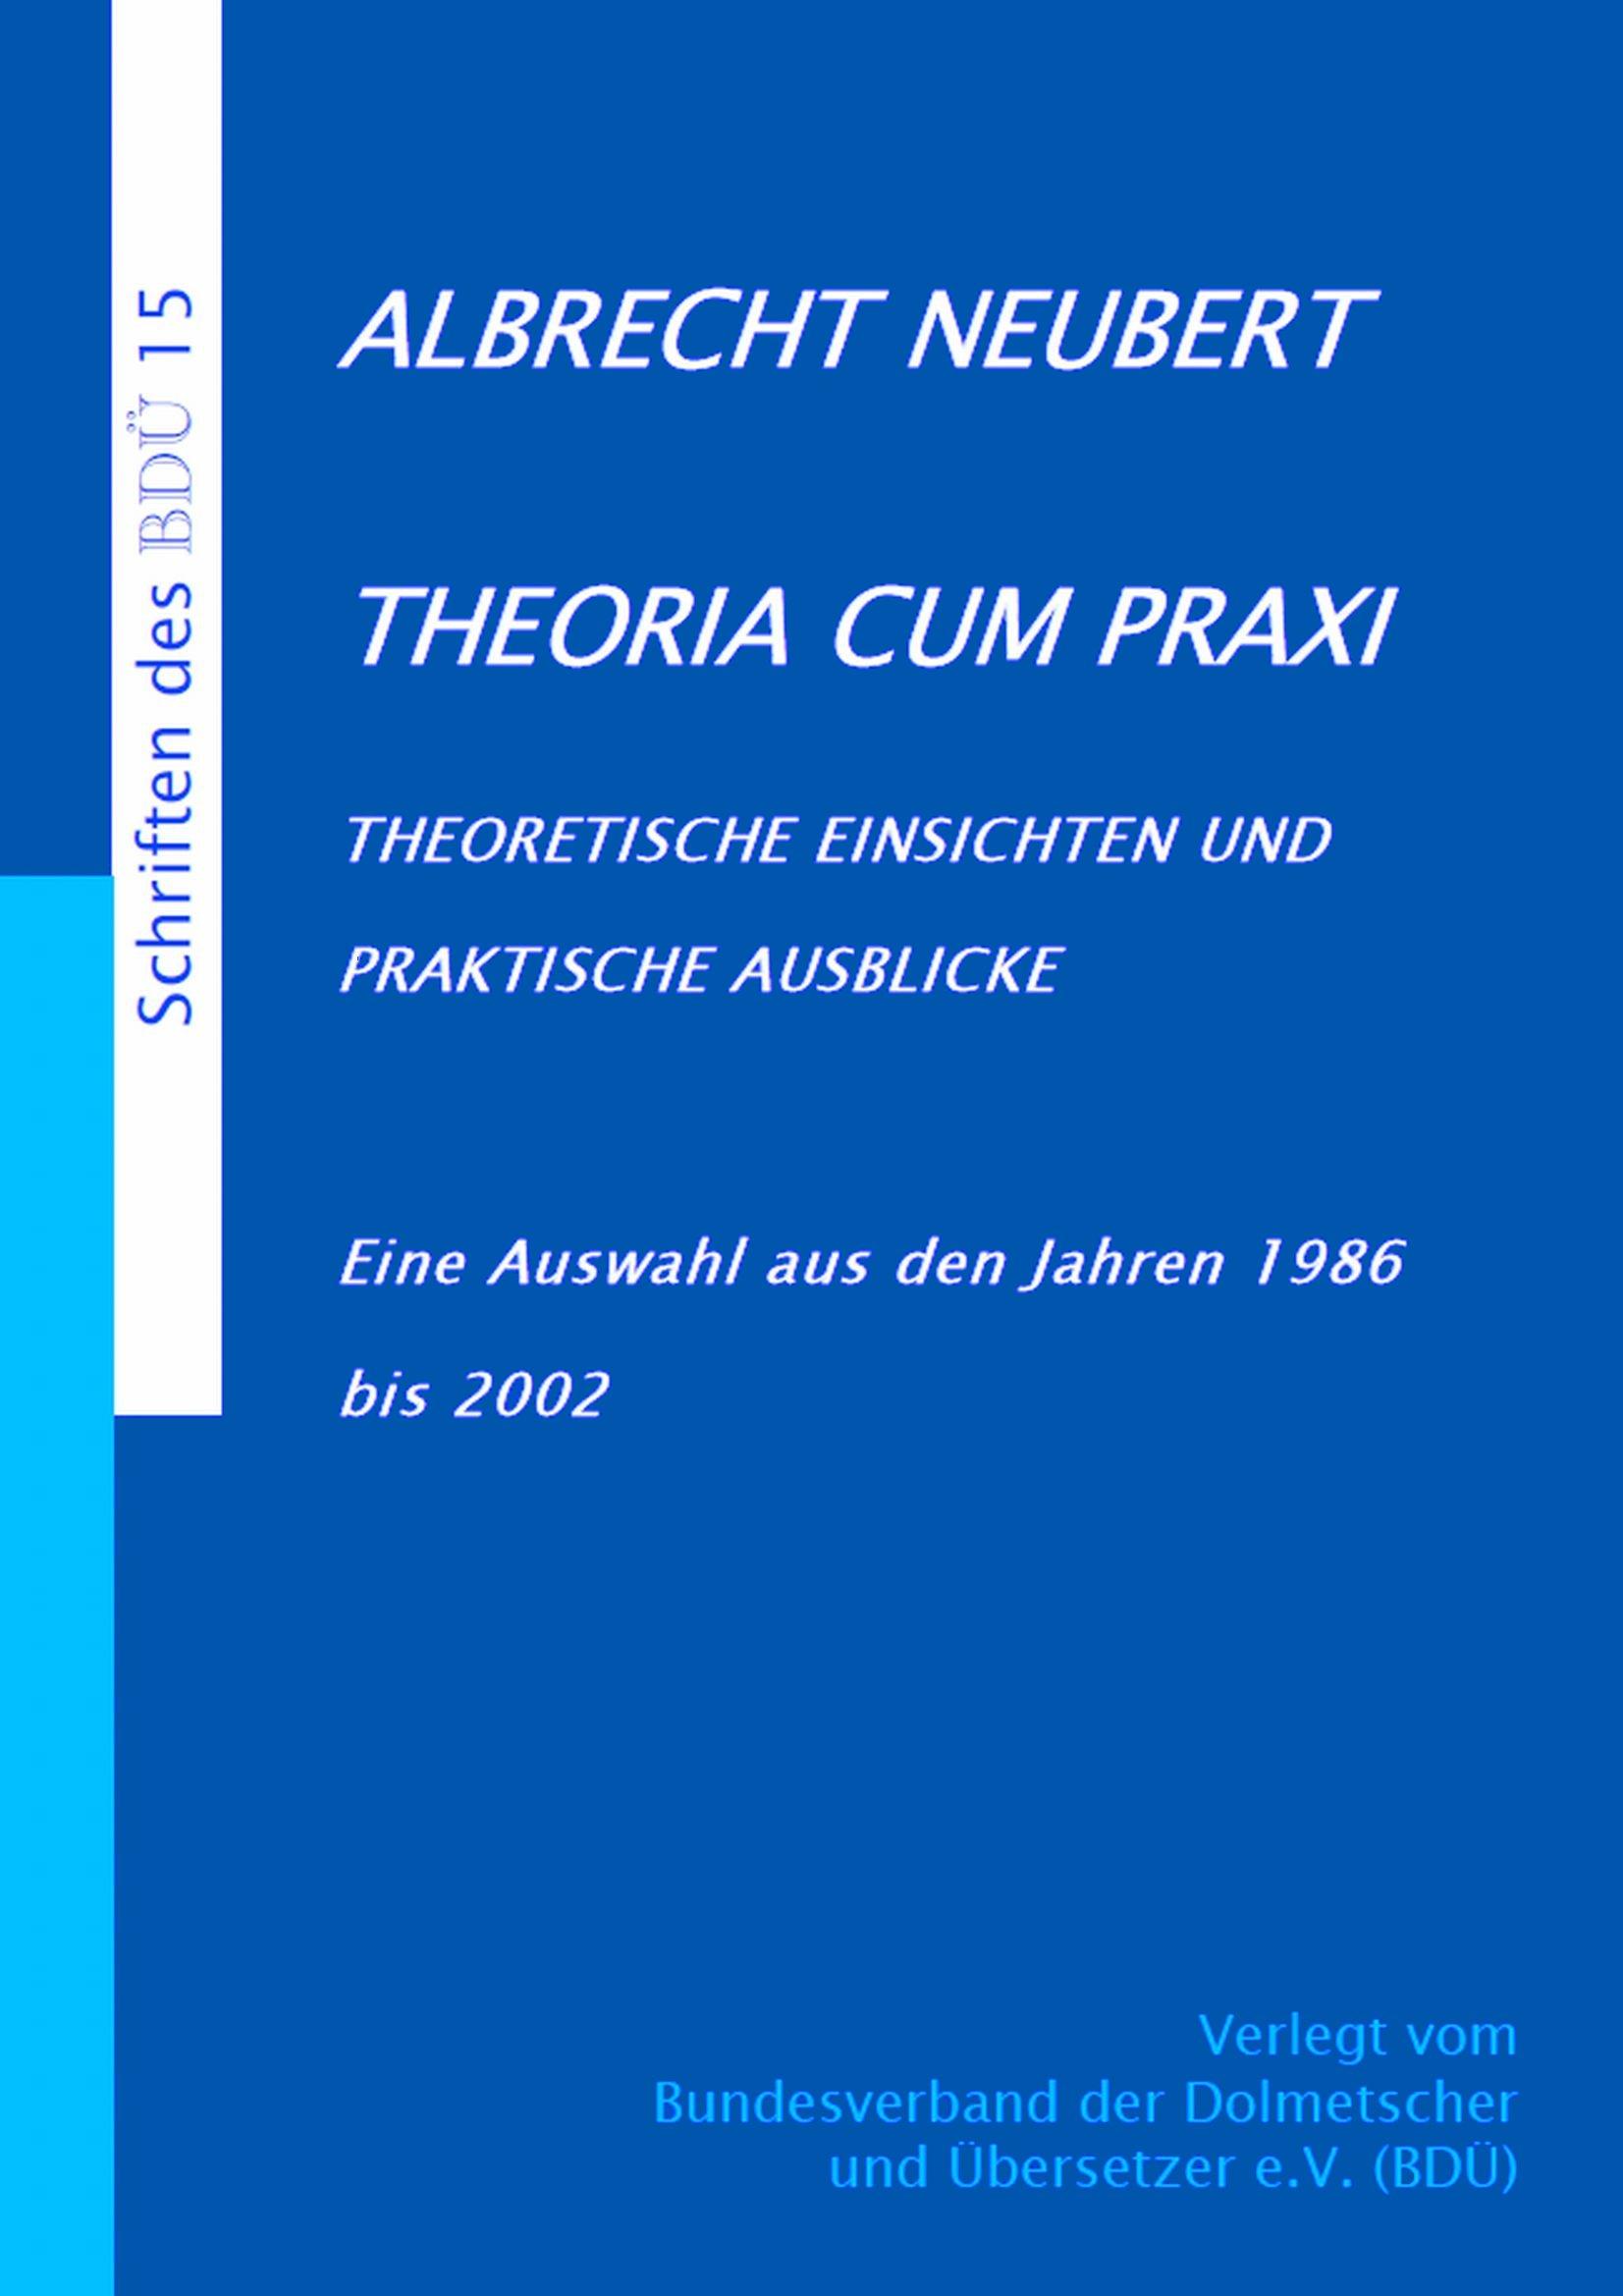 Theoria cum Praxi